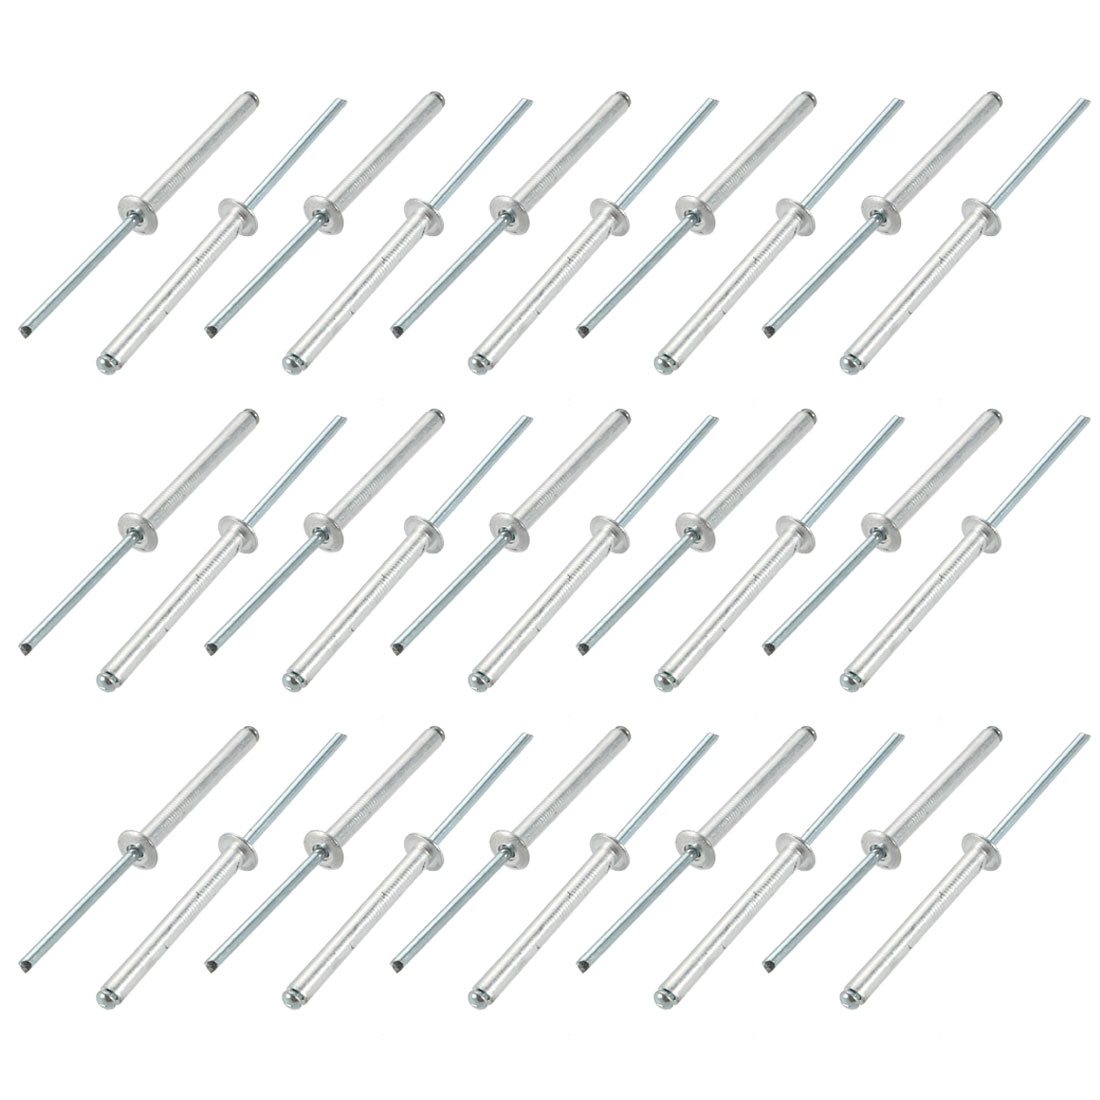 30 Pcs 4mm x 35mm Aluminum/Steel Open End Blind Rivets